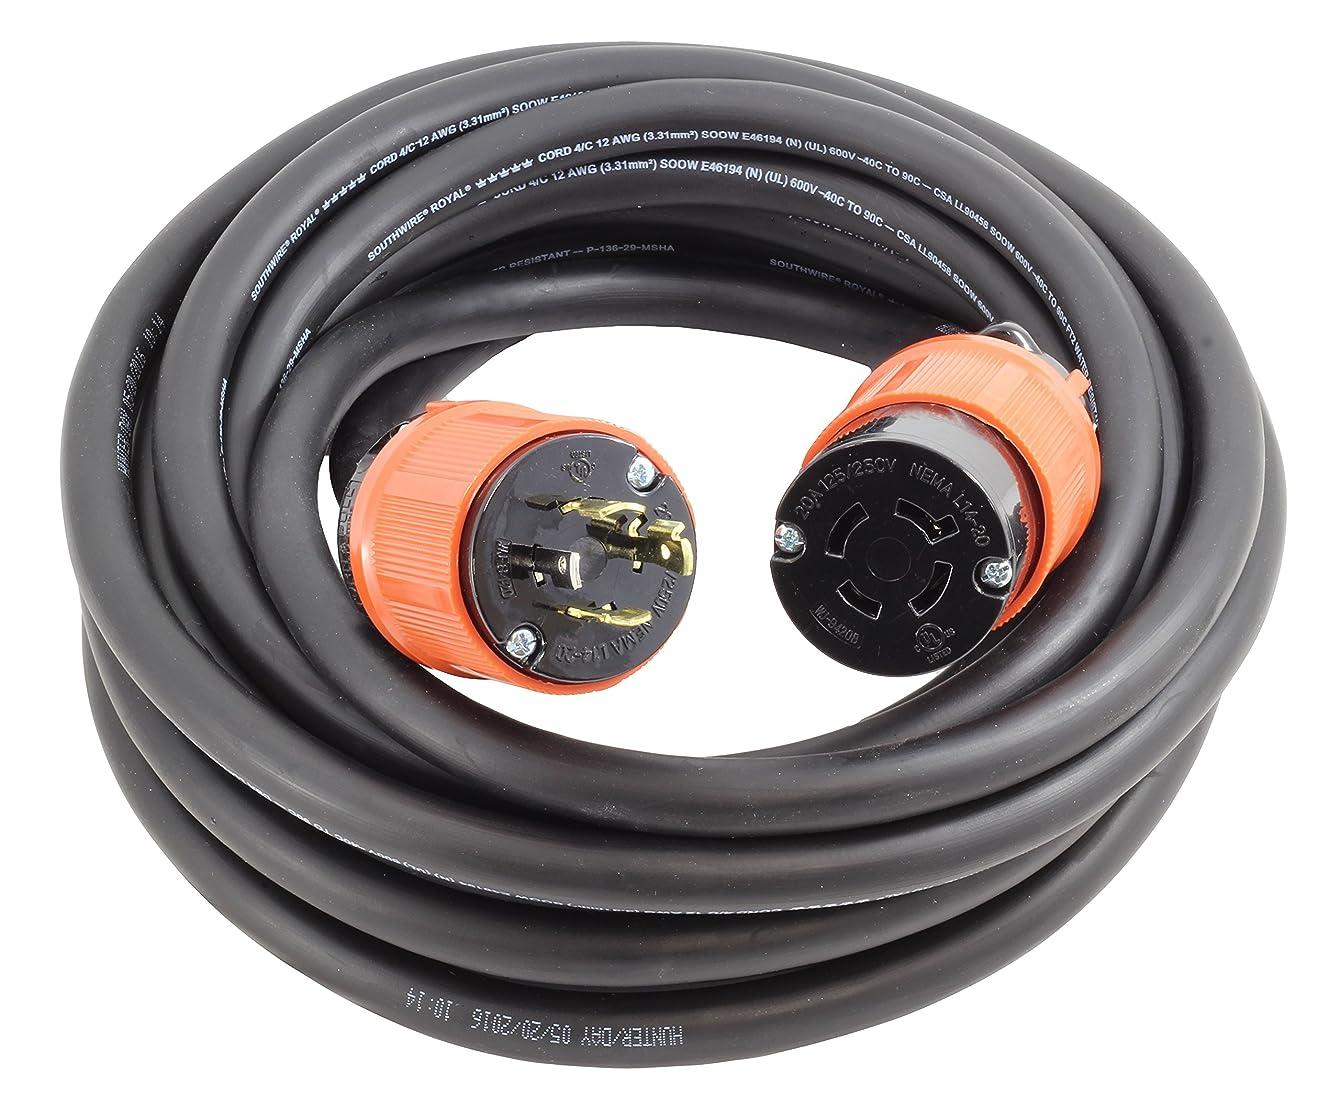 AC WORKS NEMA L14-20 Rubber SOOW 12/4 Extension Cord (10FT)